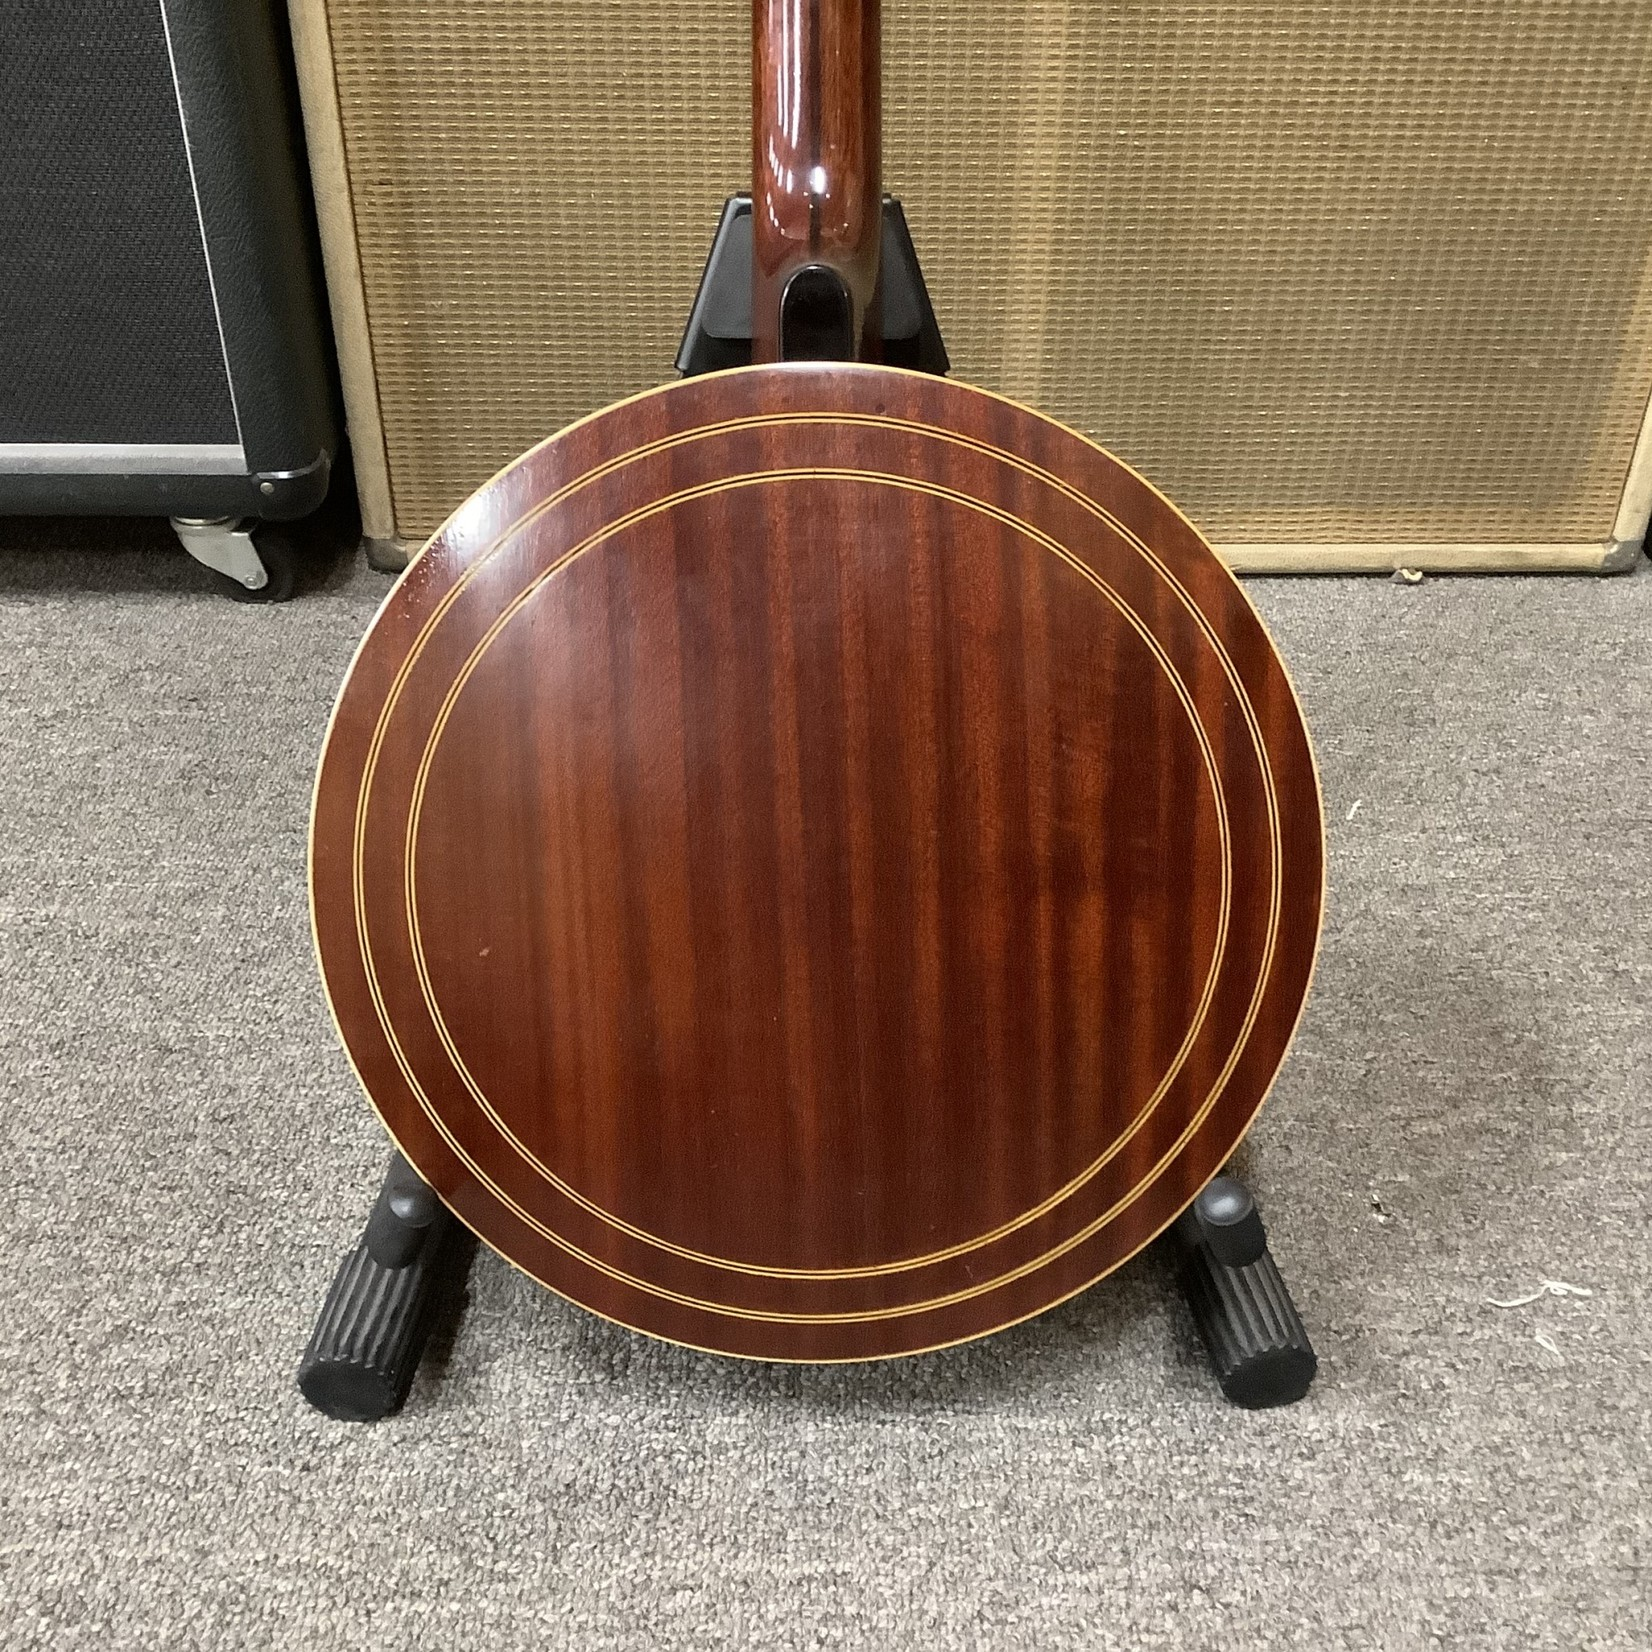 Aftermarket Gibson Clone Banjo